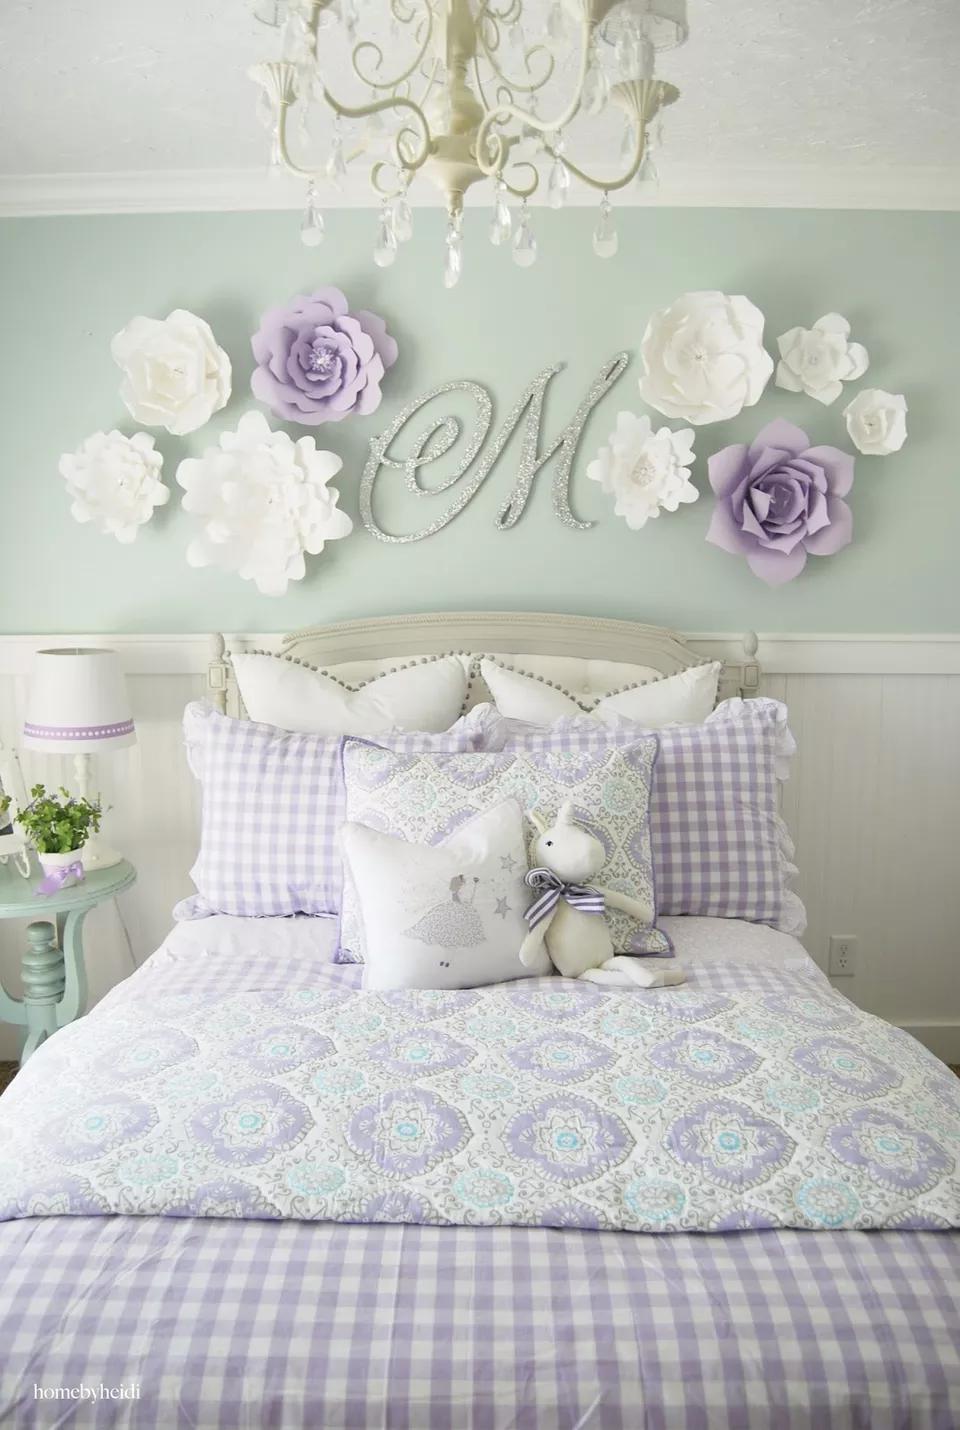 24 Wall Decor Ideas For Girls Rooms Girls Room Paint Diy Girls Bedroom Girl Room